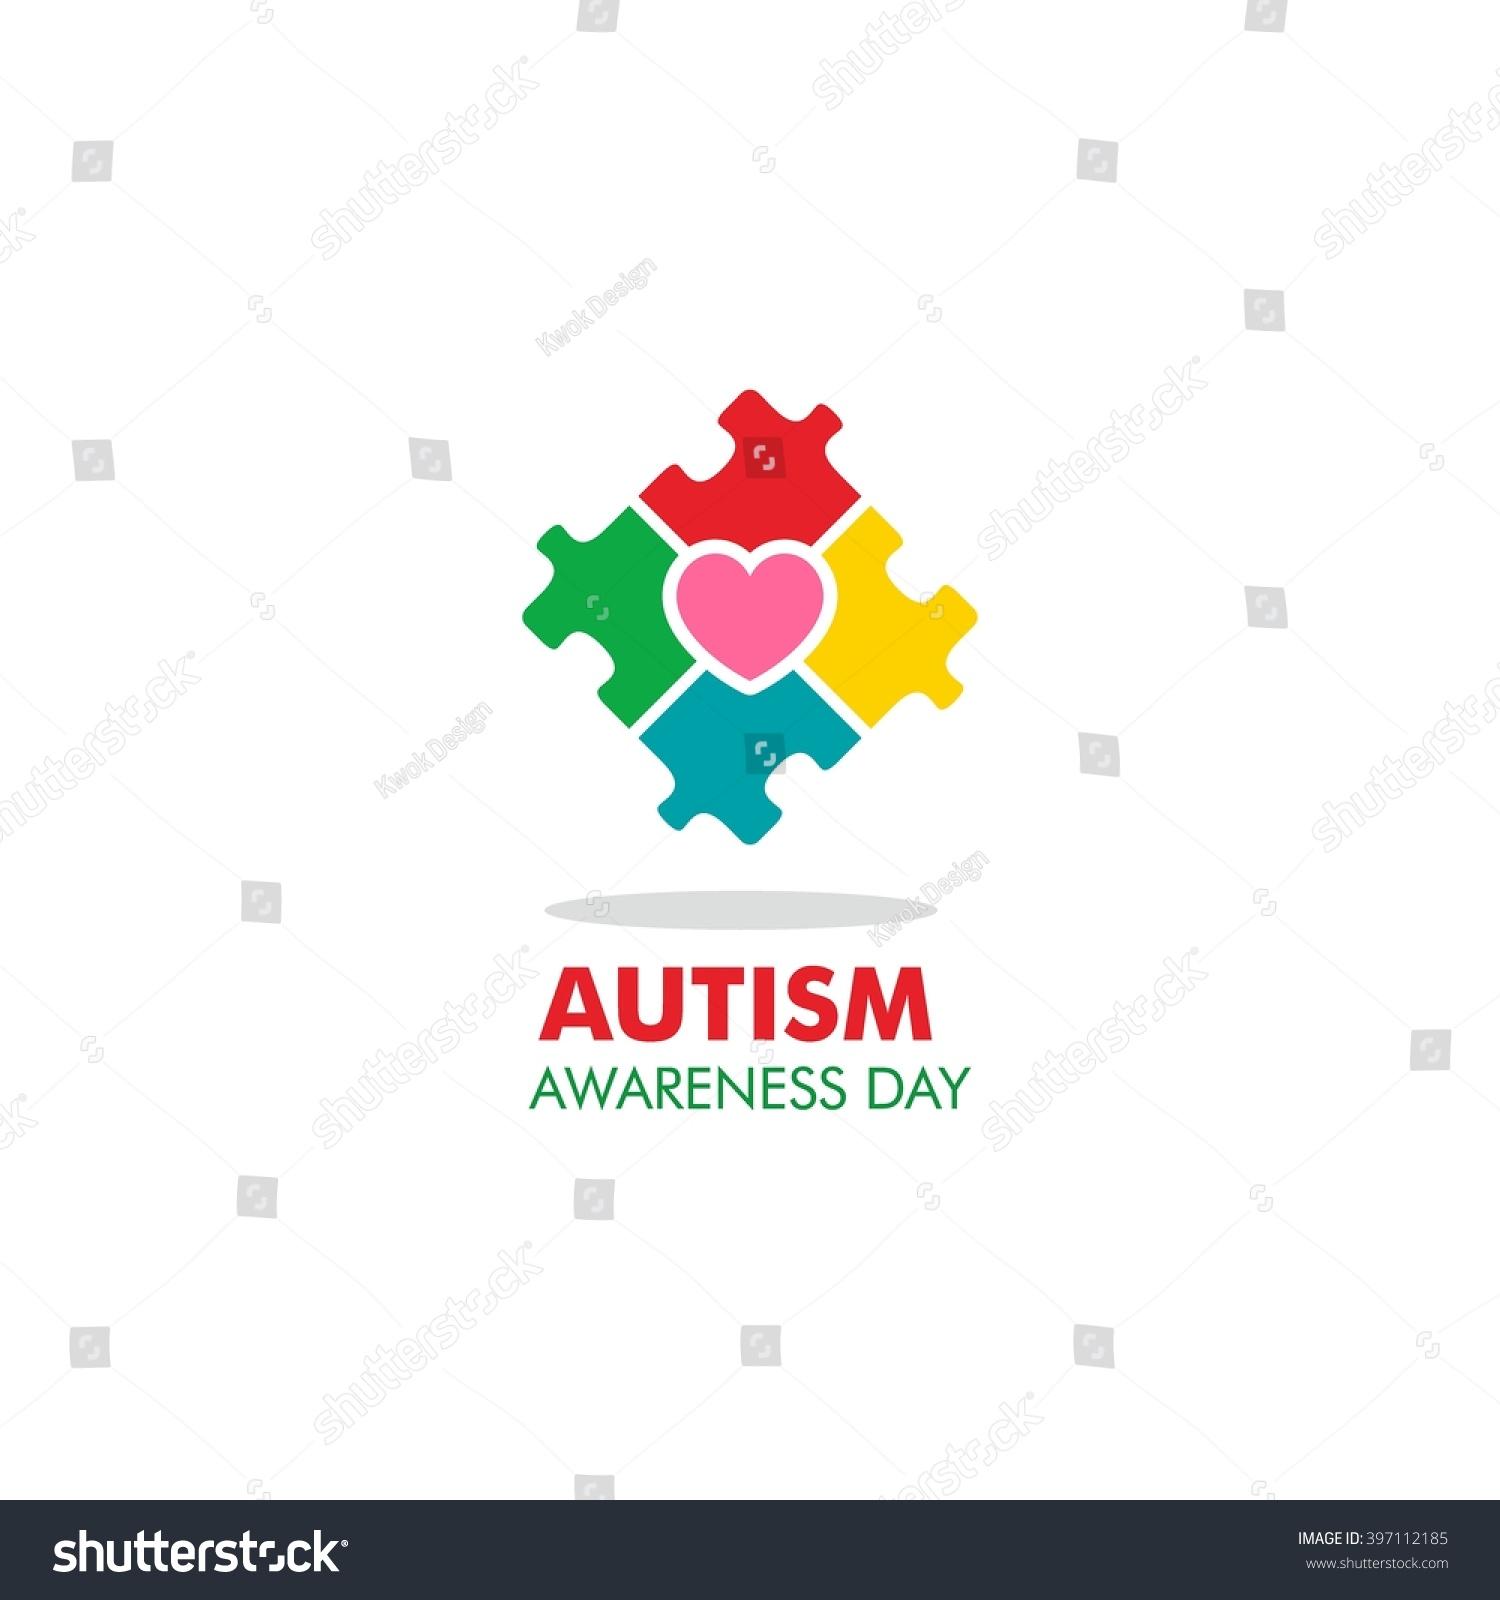 World autism awareness day logo design stock vector 397112185 world autism awareness day logo design template vector illustration colorful puzzles symbol biocorpaavc